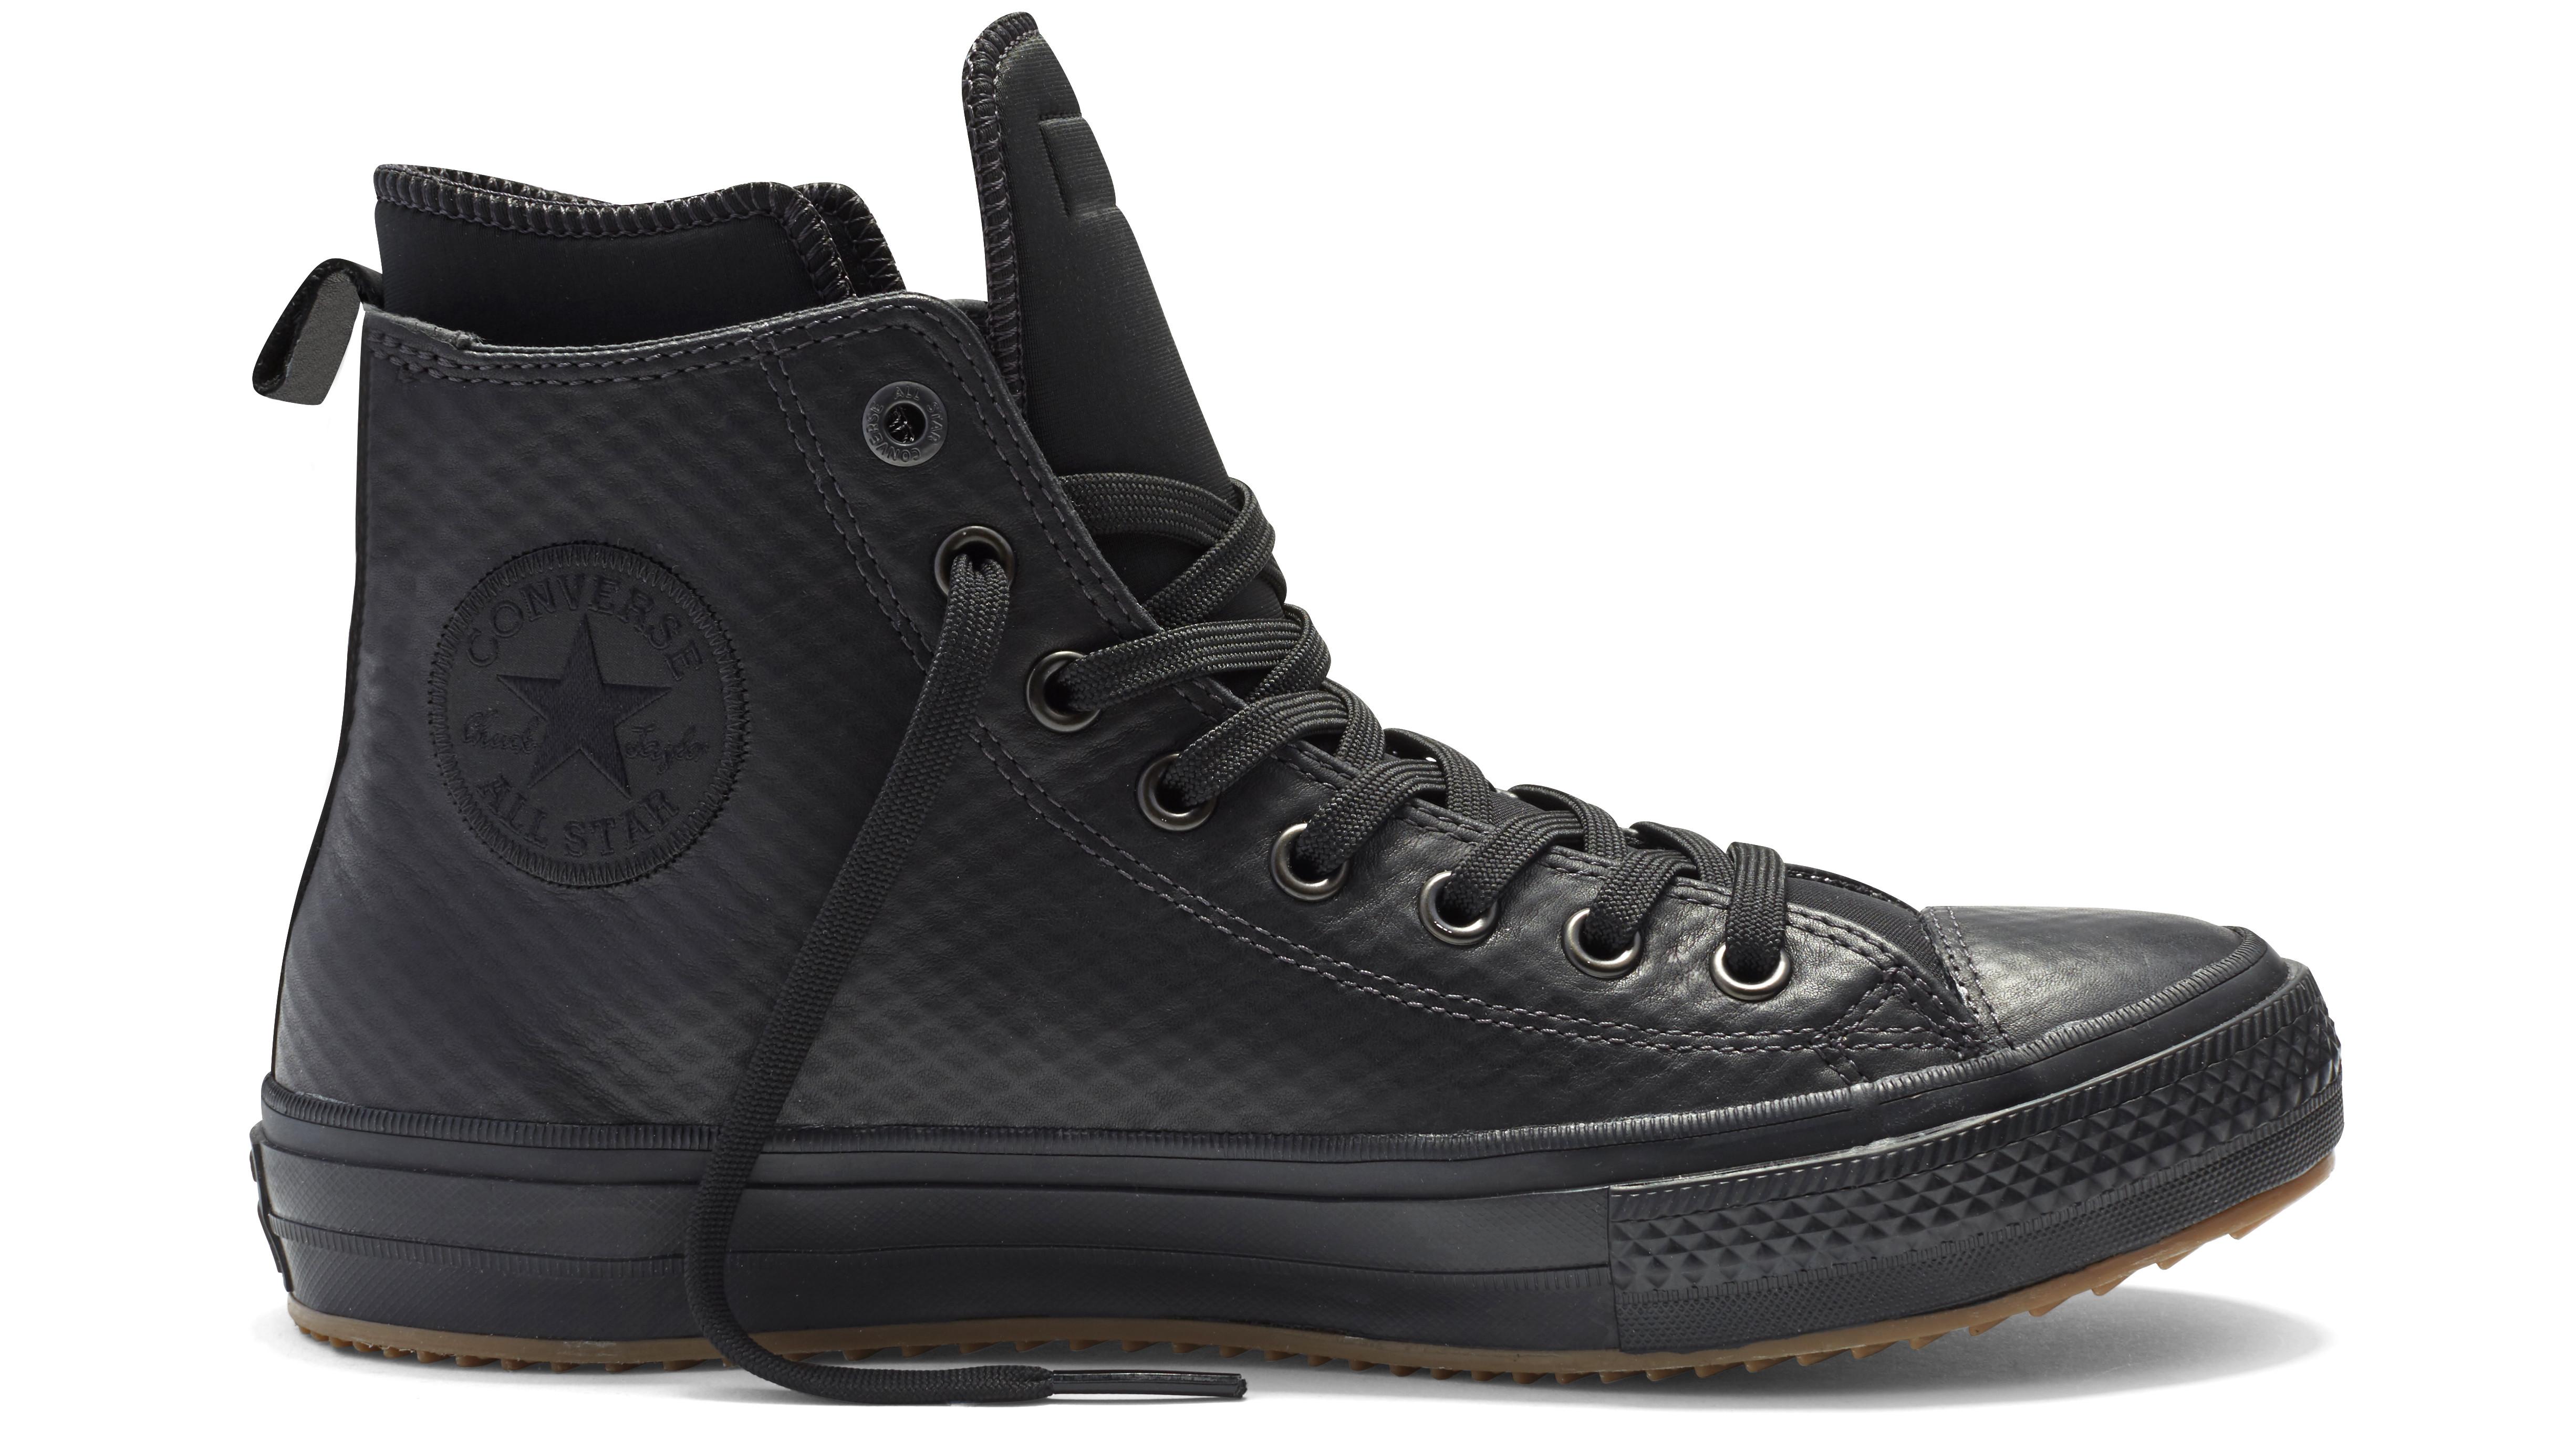 Converse Chuck Taylor 2 Boot Black